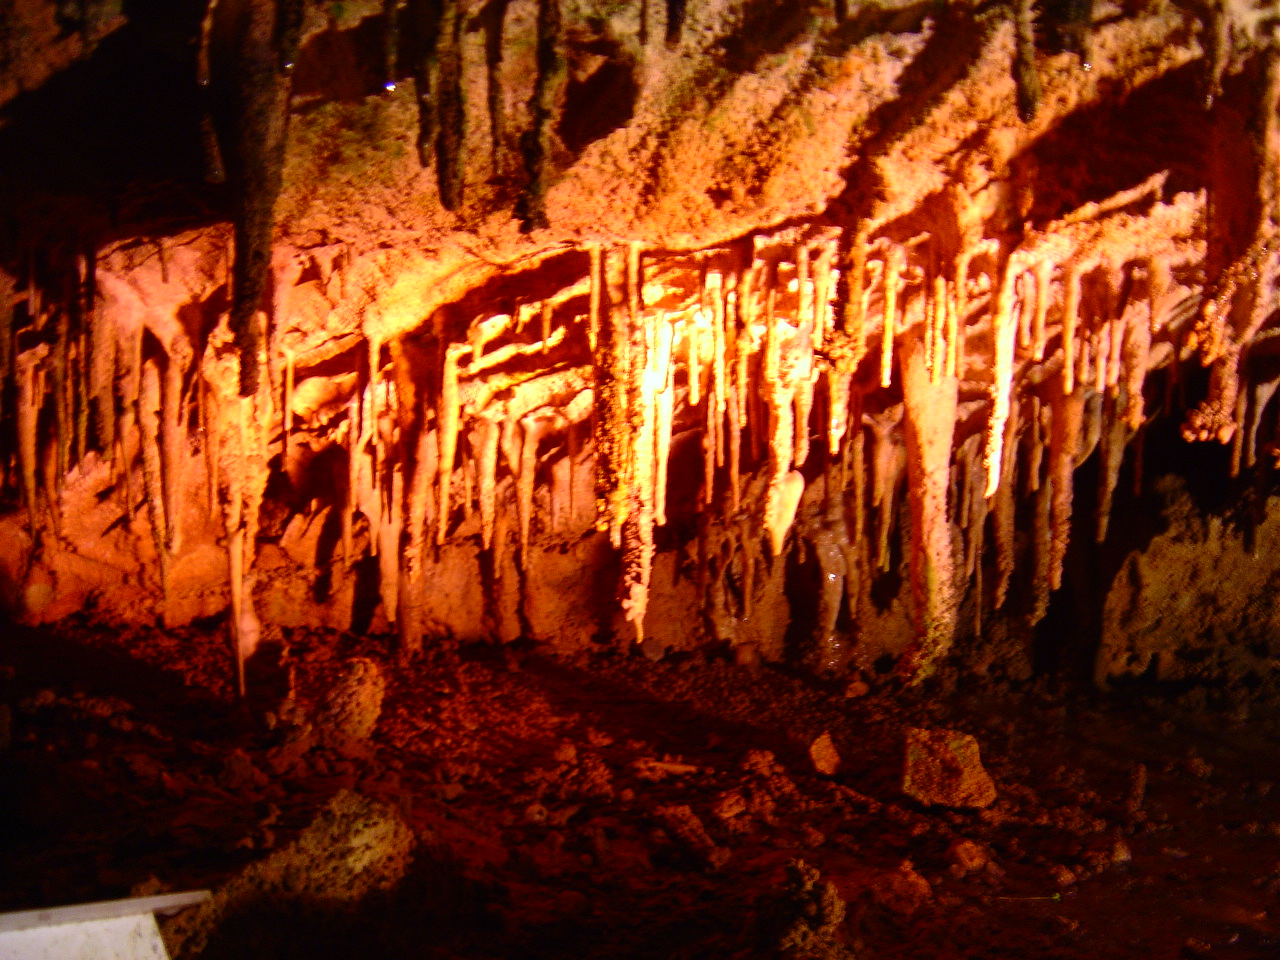 Menfudo Limestone Cave, Nara